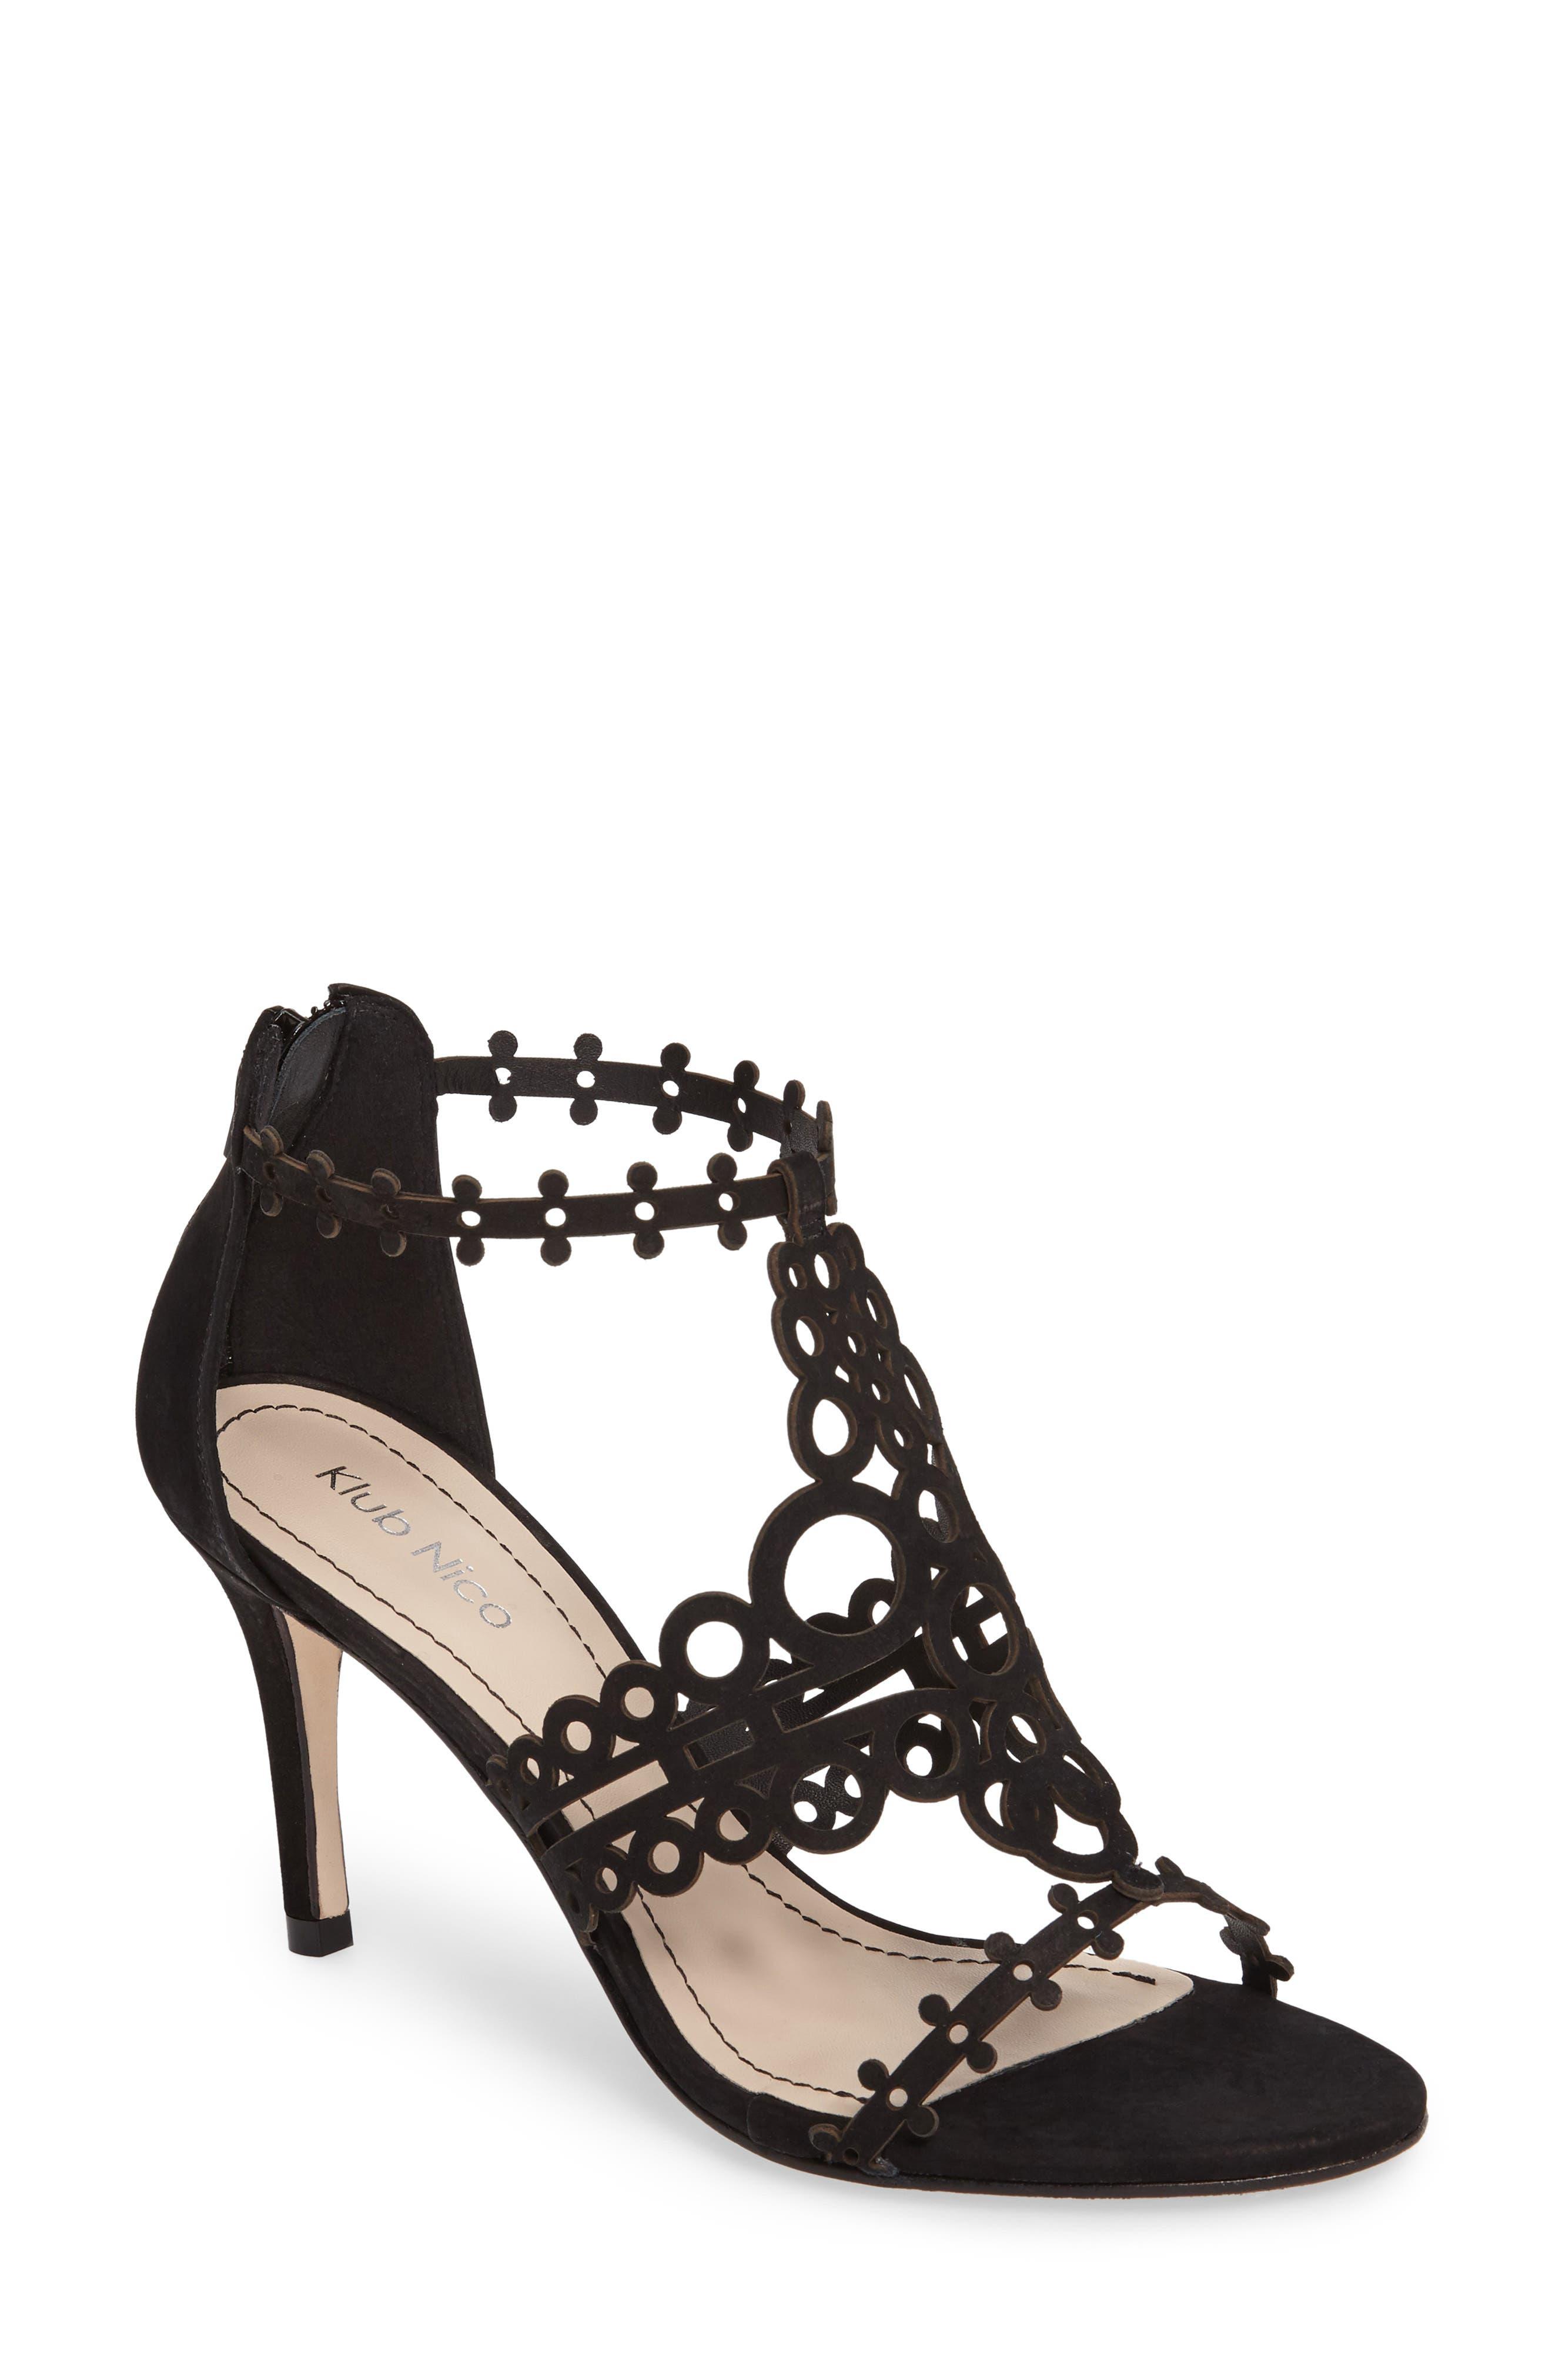 KLUB NICO 'Antonia' Laser Cut T-Strap Sandal